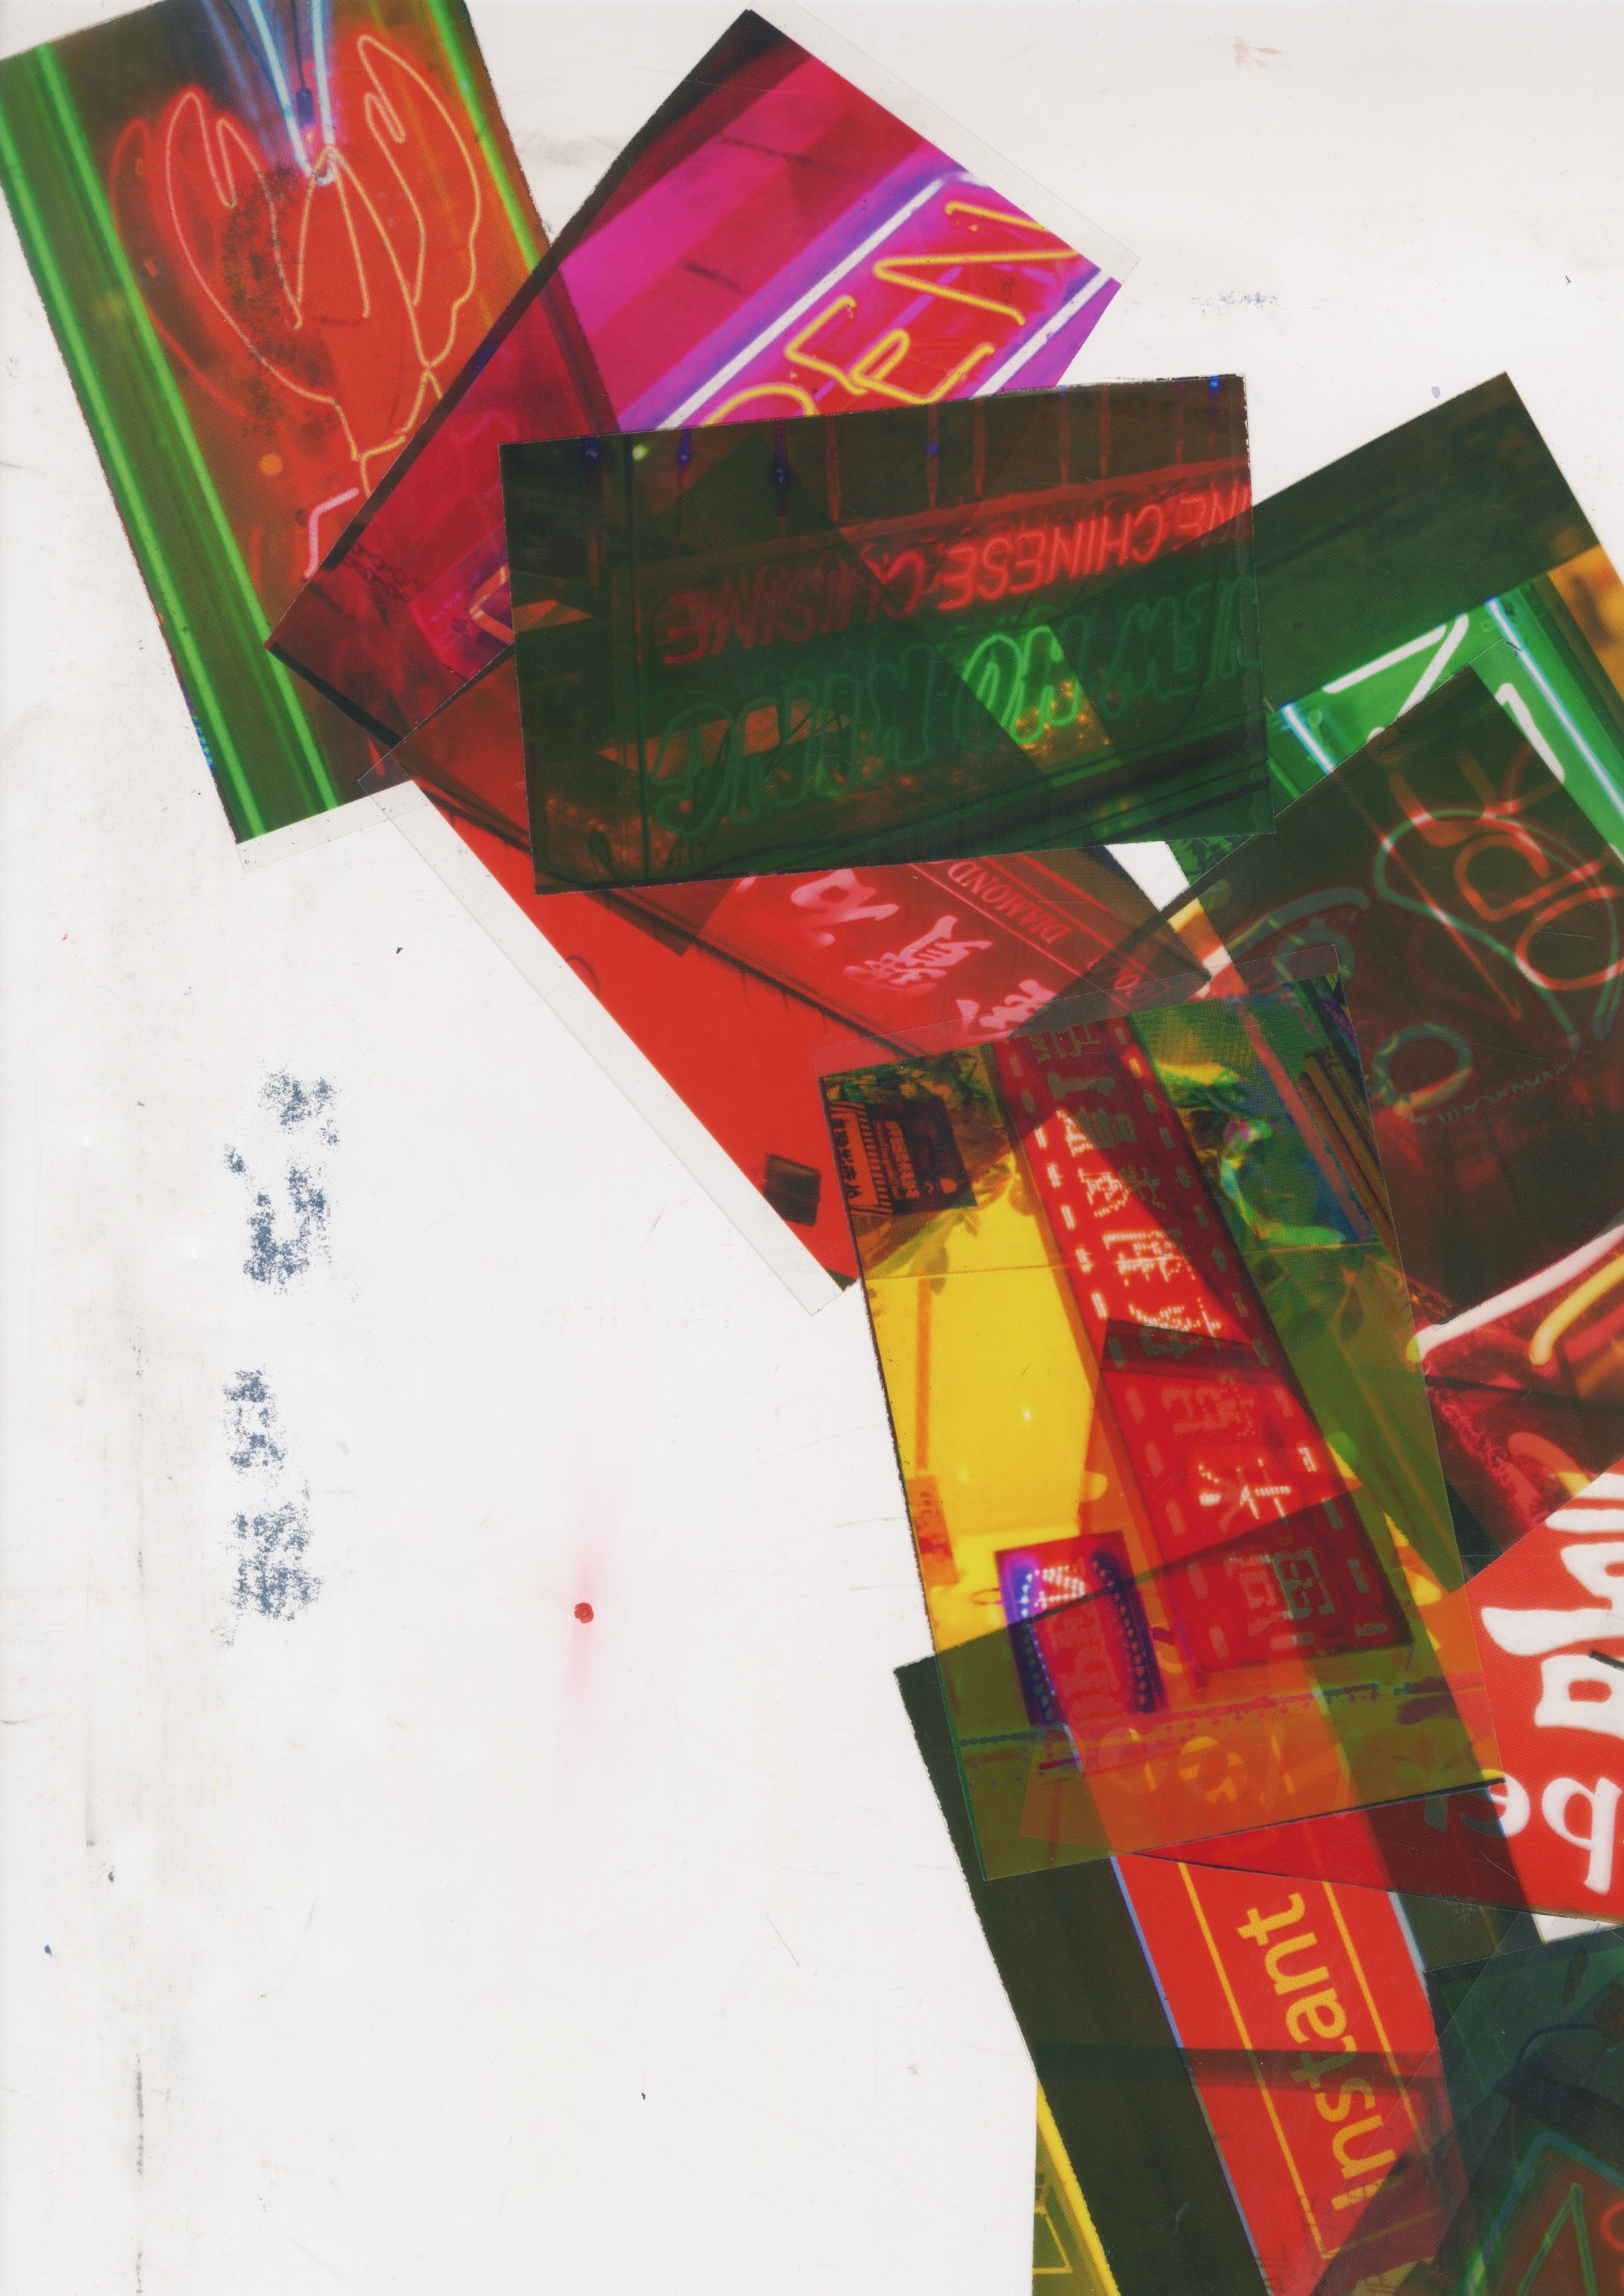 Jan 23rd chinatown scans.jpeg